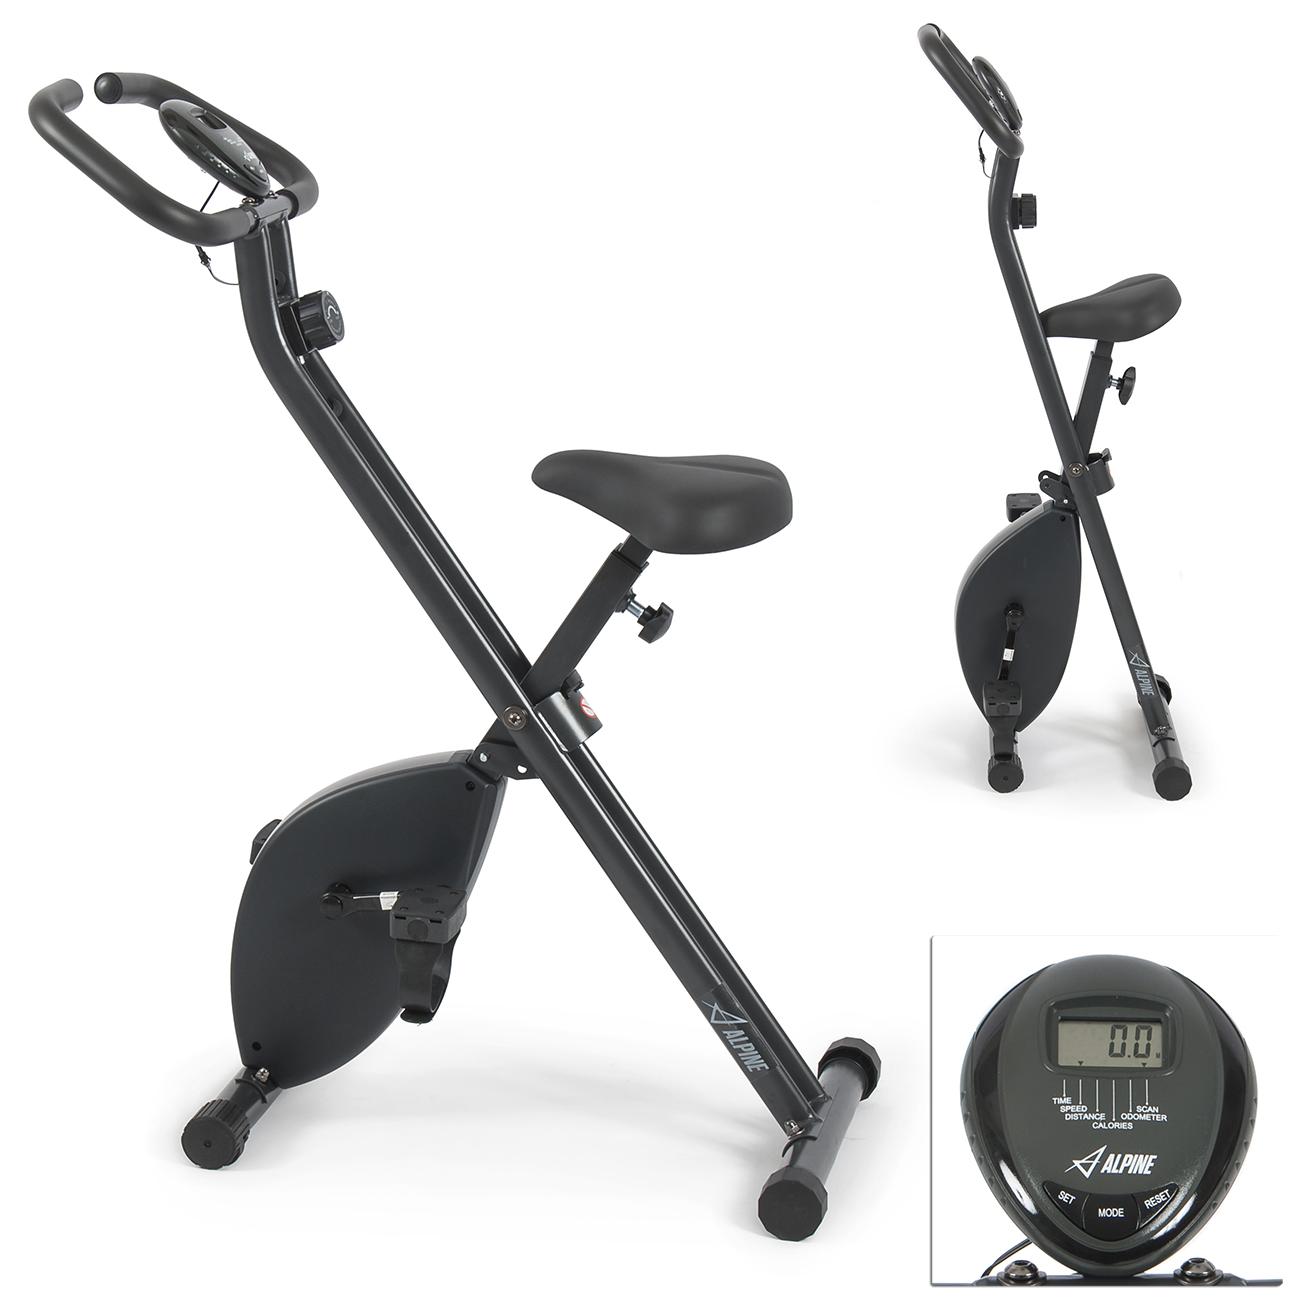 Exercise Bike Display: Exercise Folding Magnetic Bike Gym Cycling Cardio